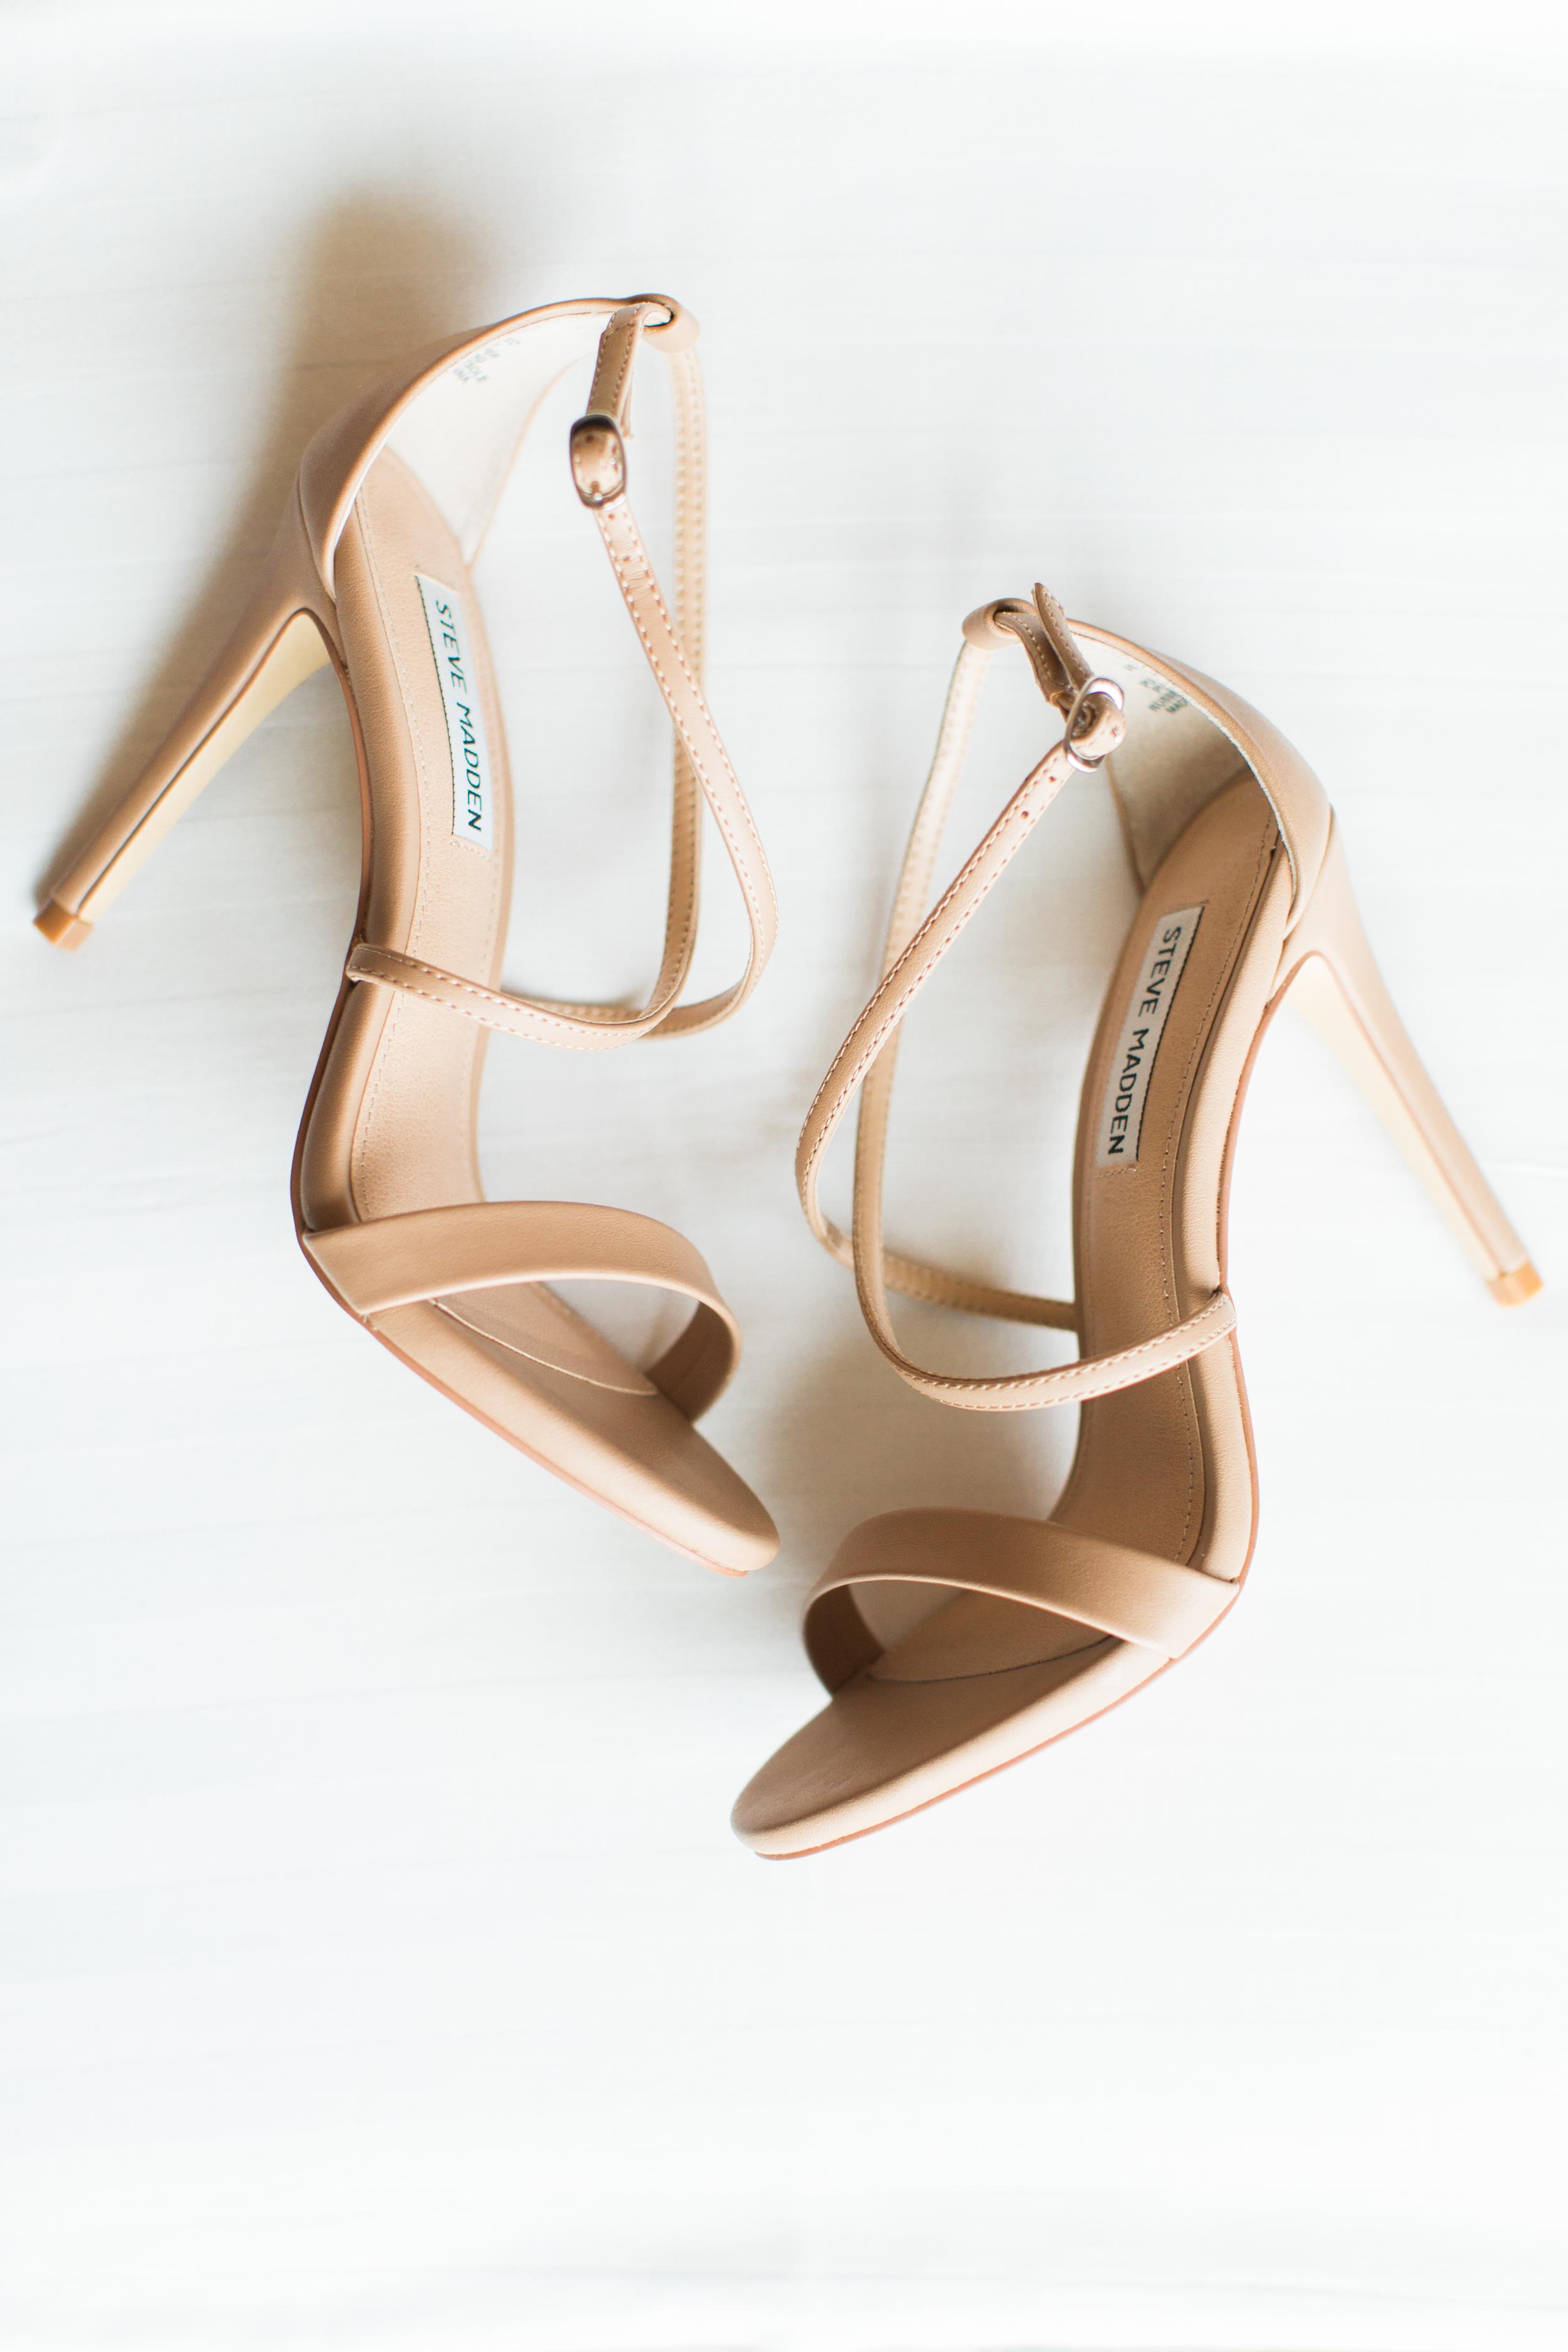 03-wedding-shoes.jpg